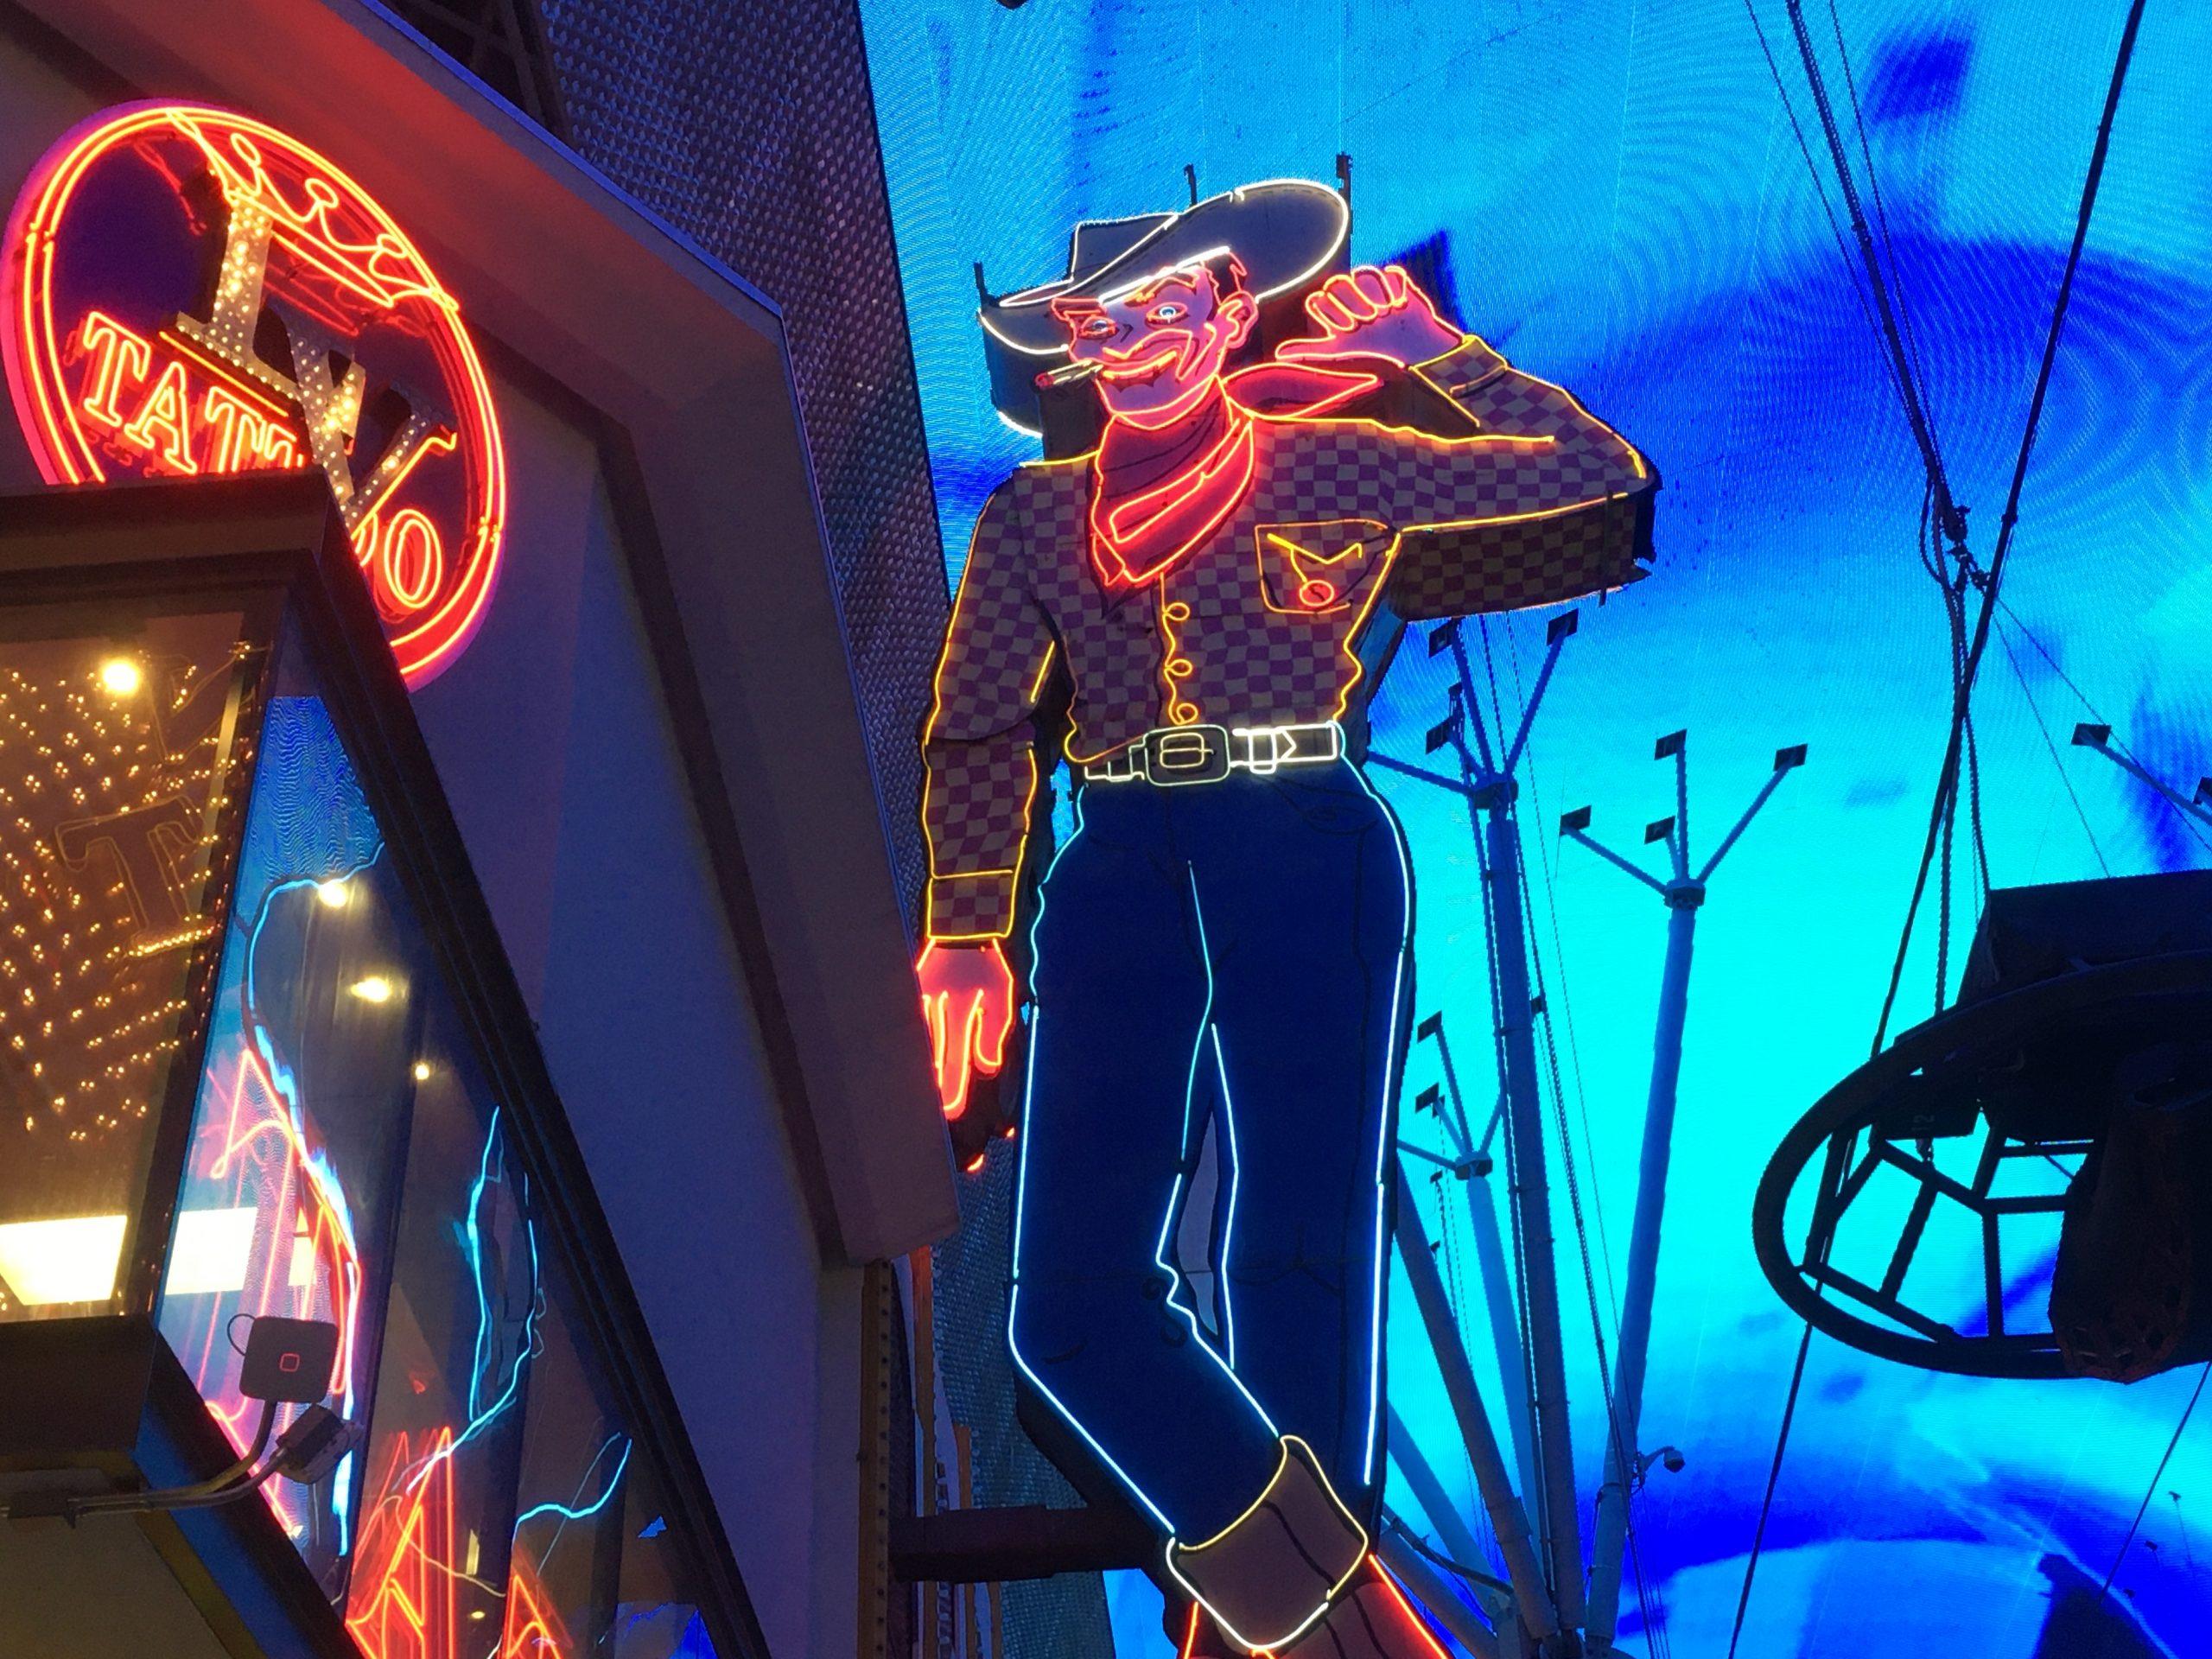 Fremont Street Experience 2019, Las Vegas 2019, Las Vegas Entertainment Scene 2019, Las Vegas News 2019, News 2019, Vegas Vic Fremont Street Experience, Vegas Vic Sign 2019, Vegas Vic Sign Lights Up, Vegas Vic Sign Lit Up, Vegas Vice 2019